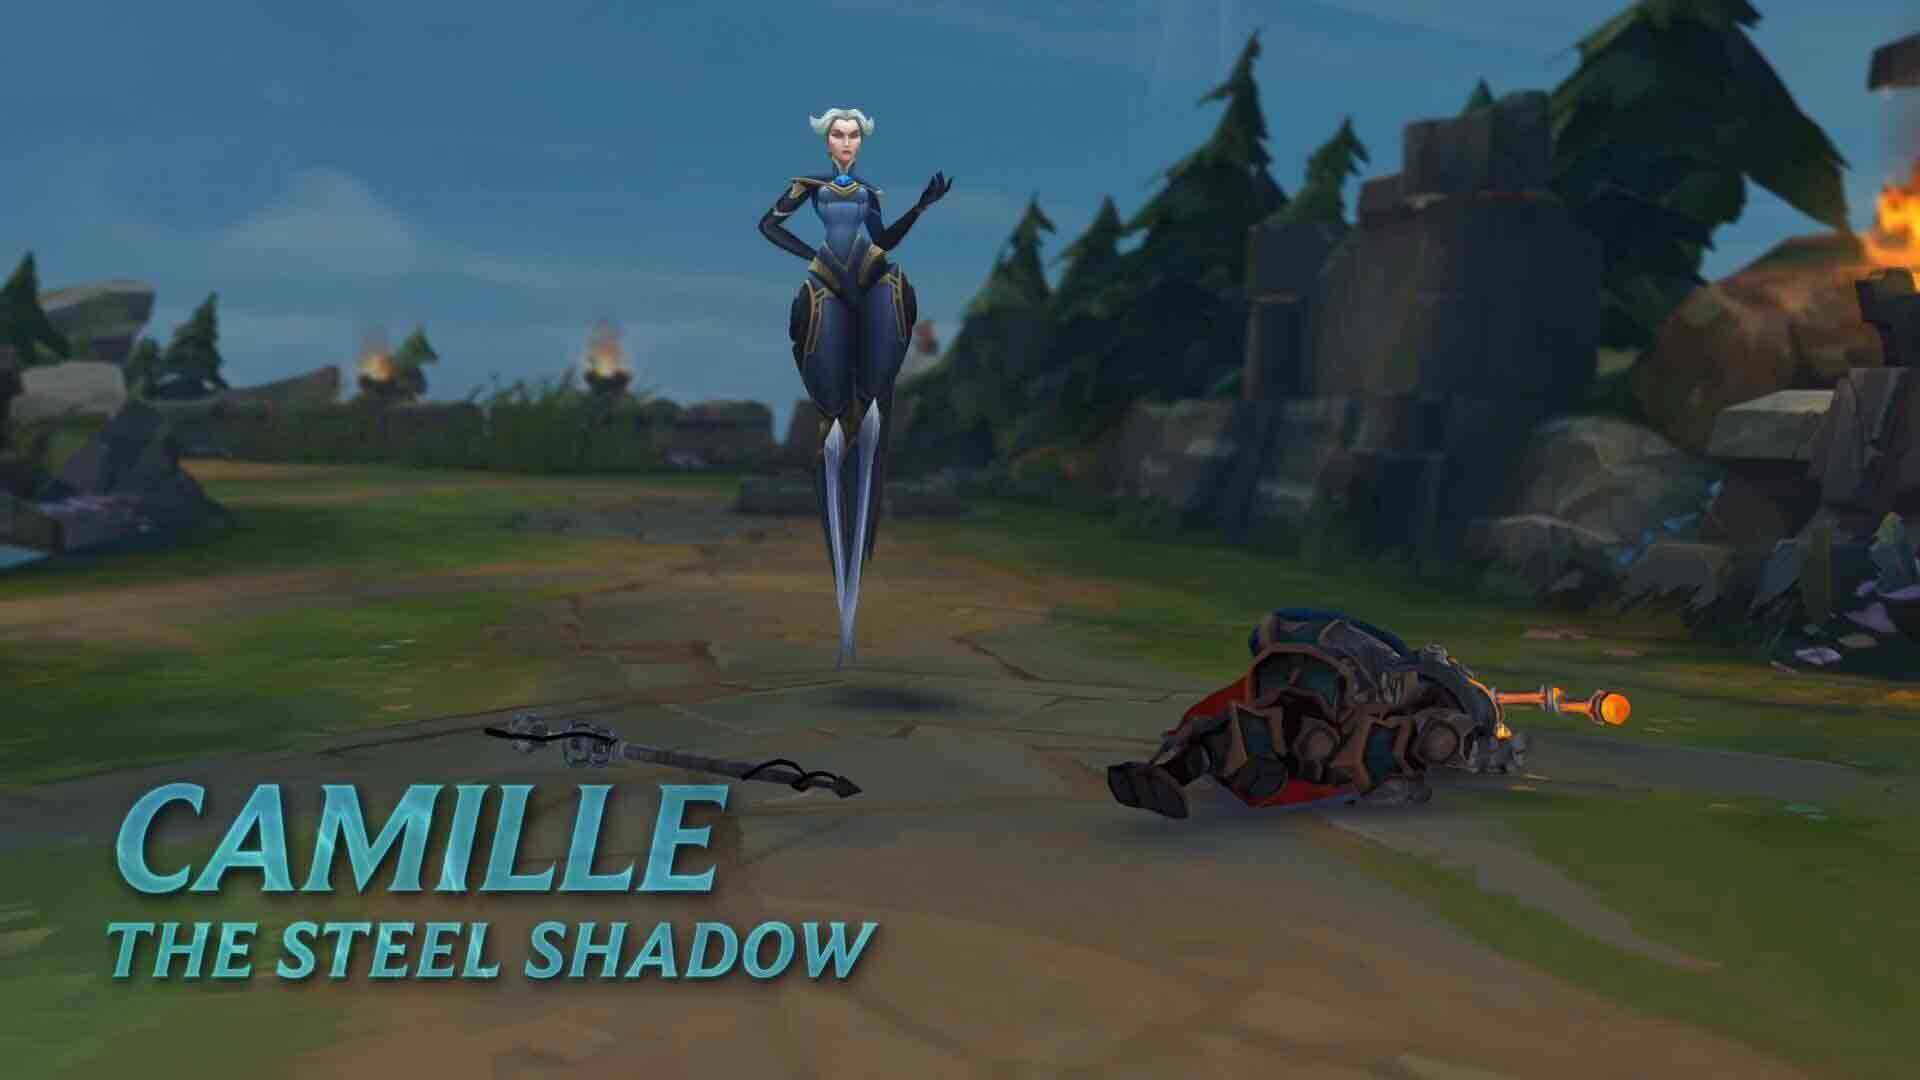 Camille-LOL-เงาดาบมรณะ2